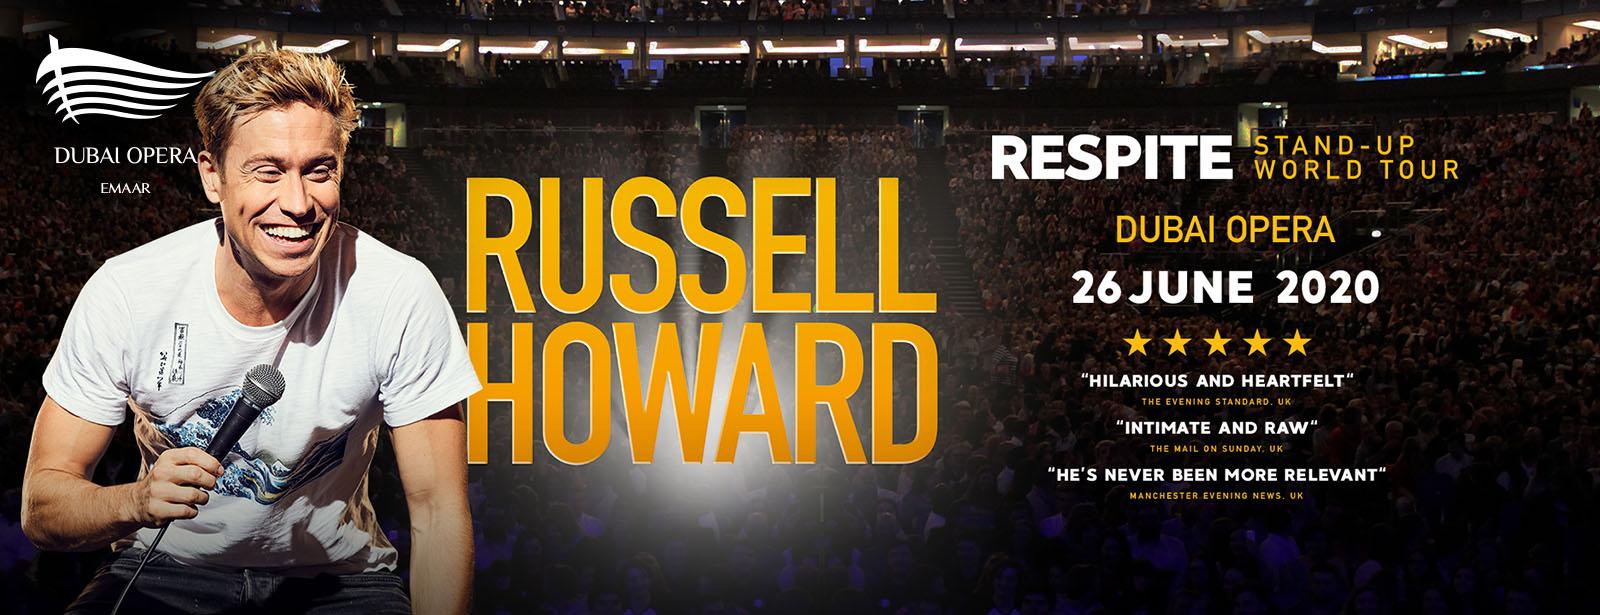 Russell Howard Live on Jun 27th at Dubai Opera 2020